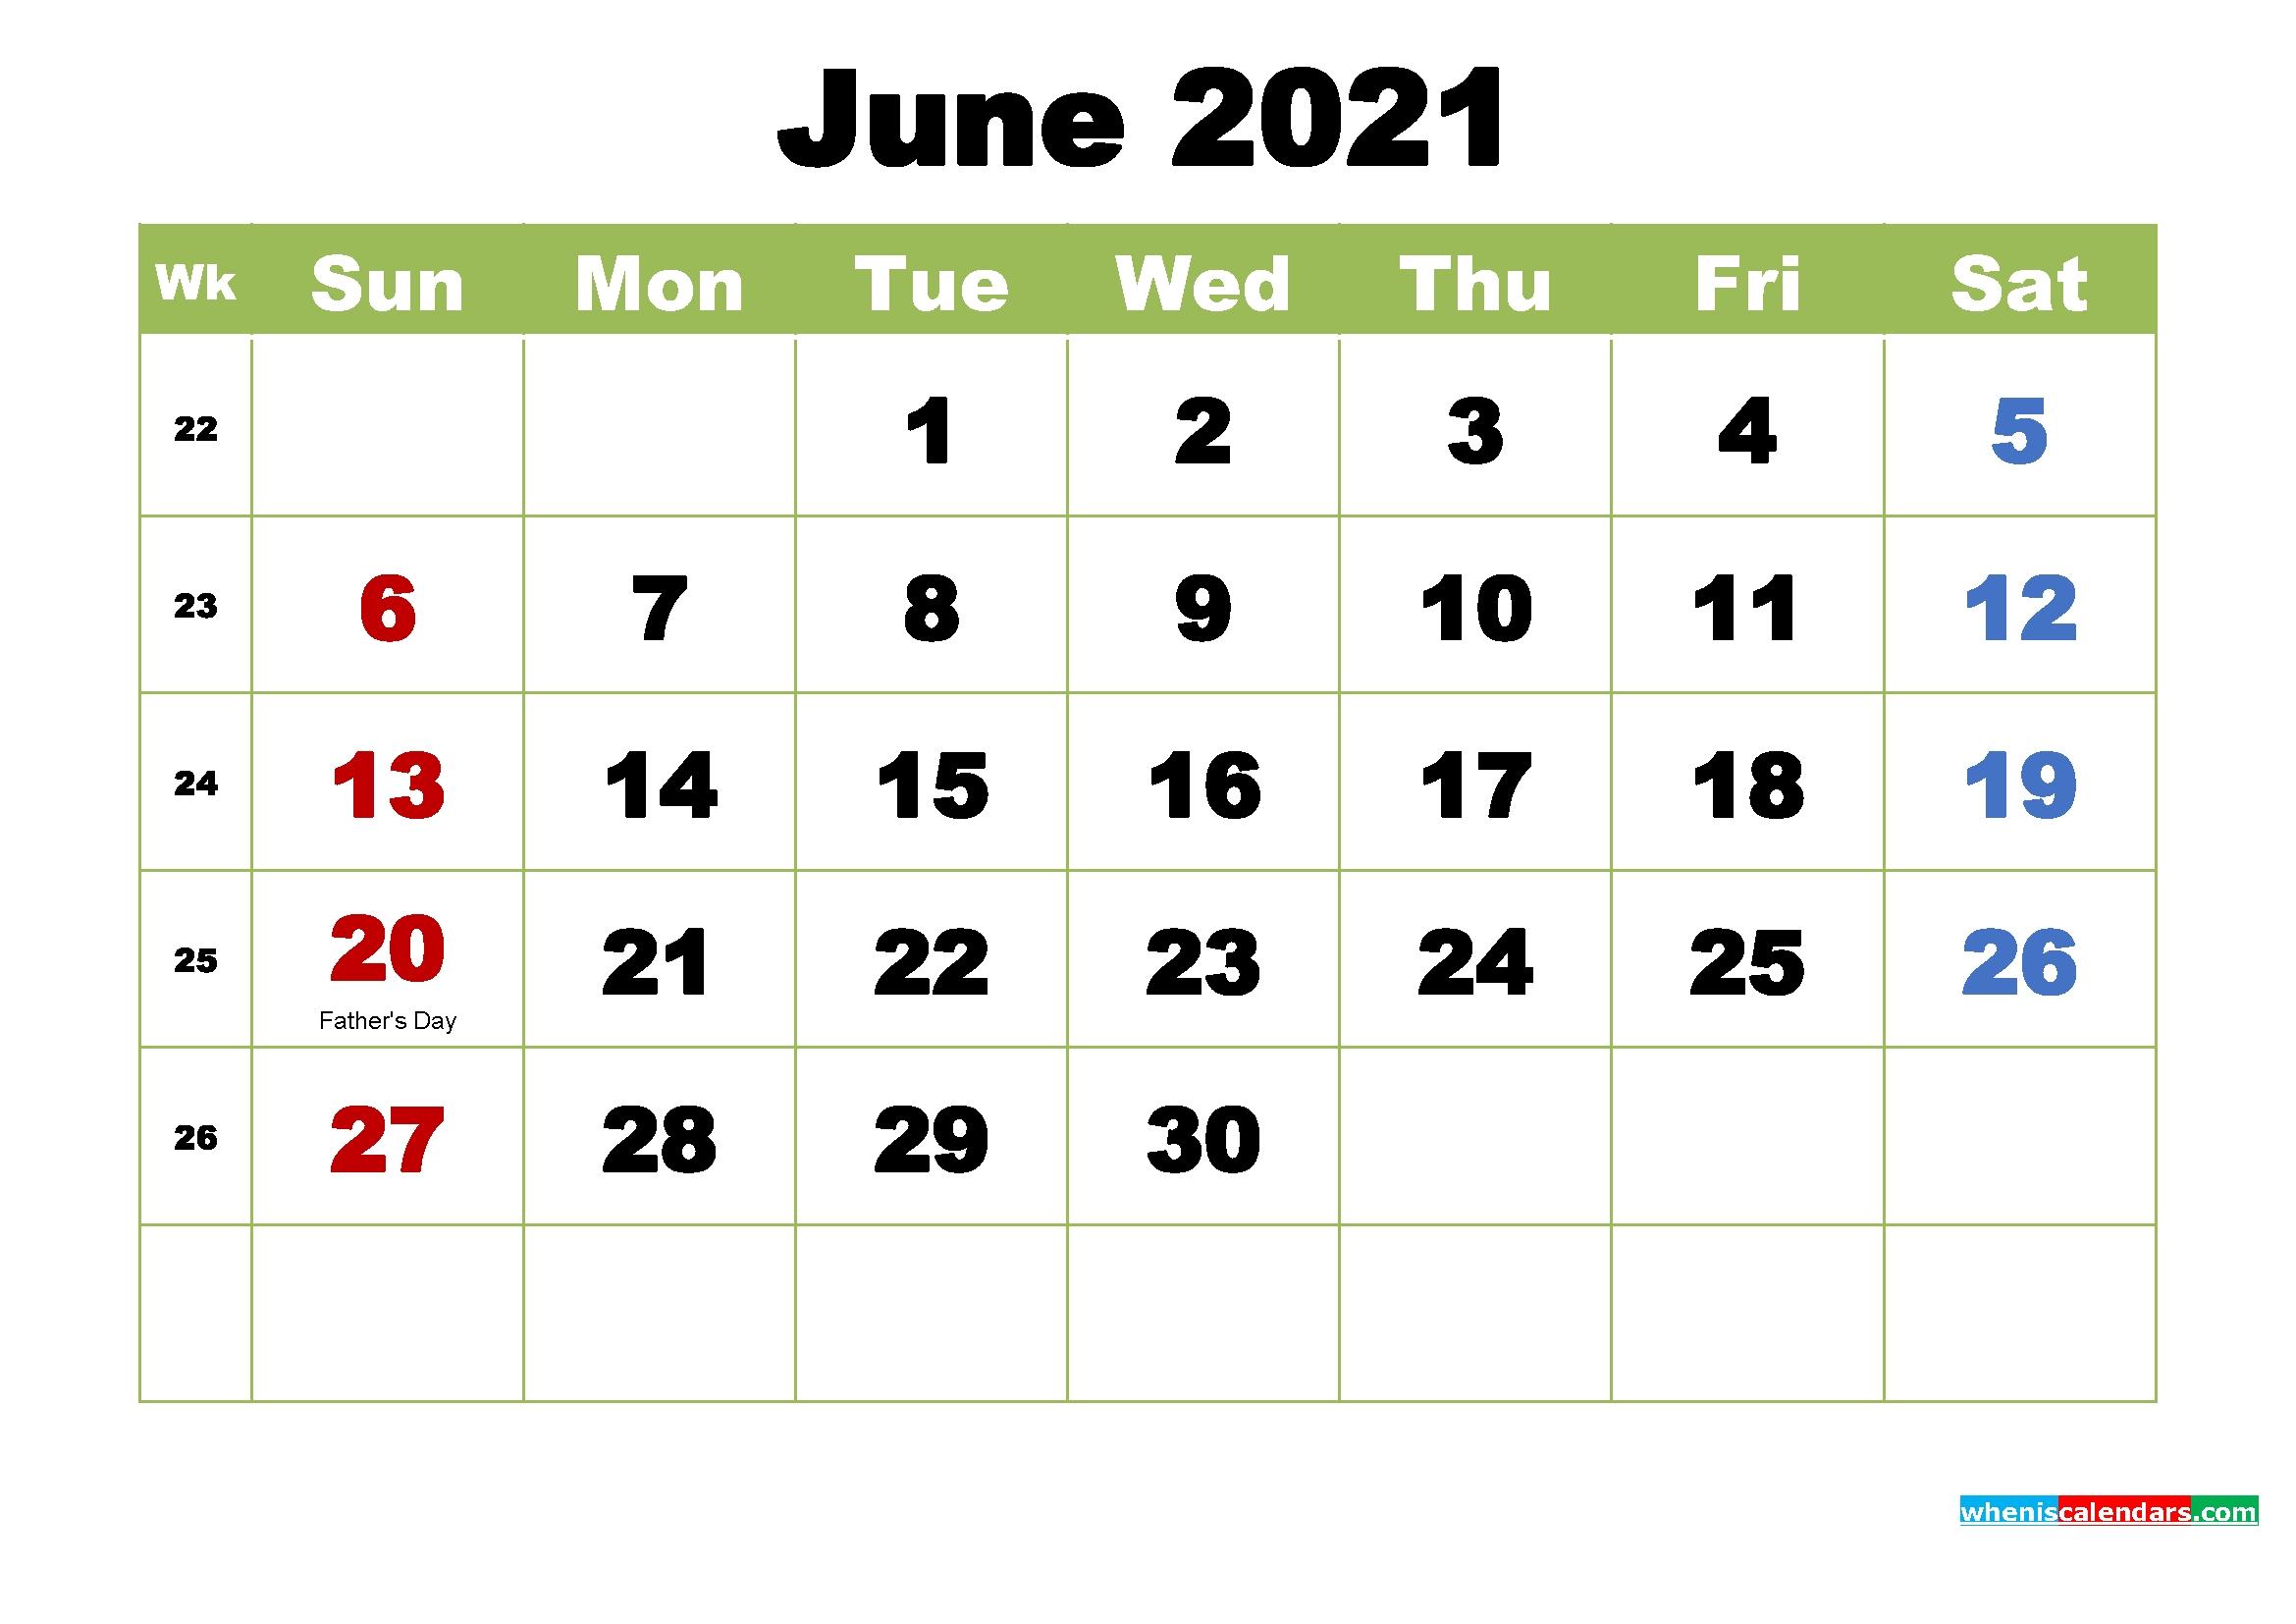 free june 2021 printable calendar with holidays